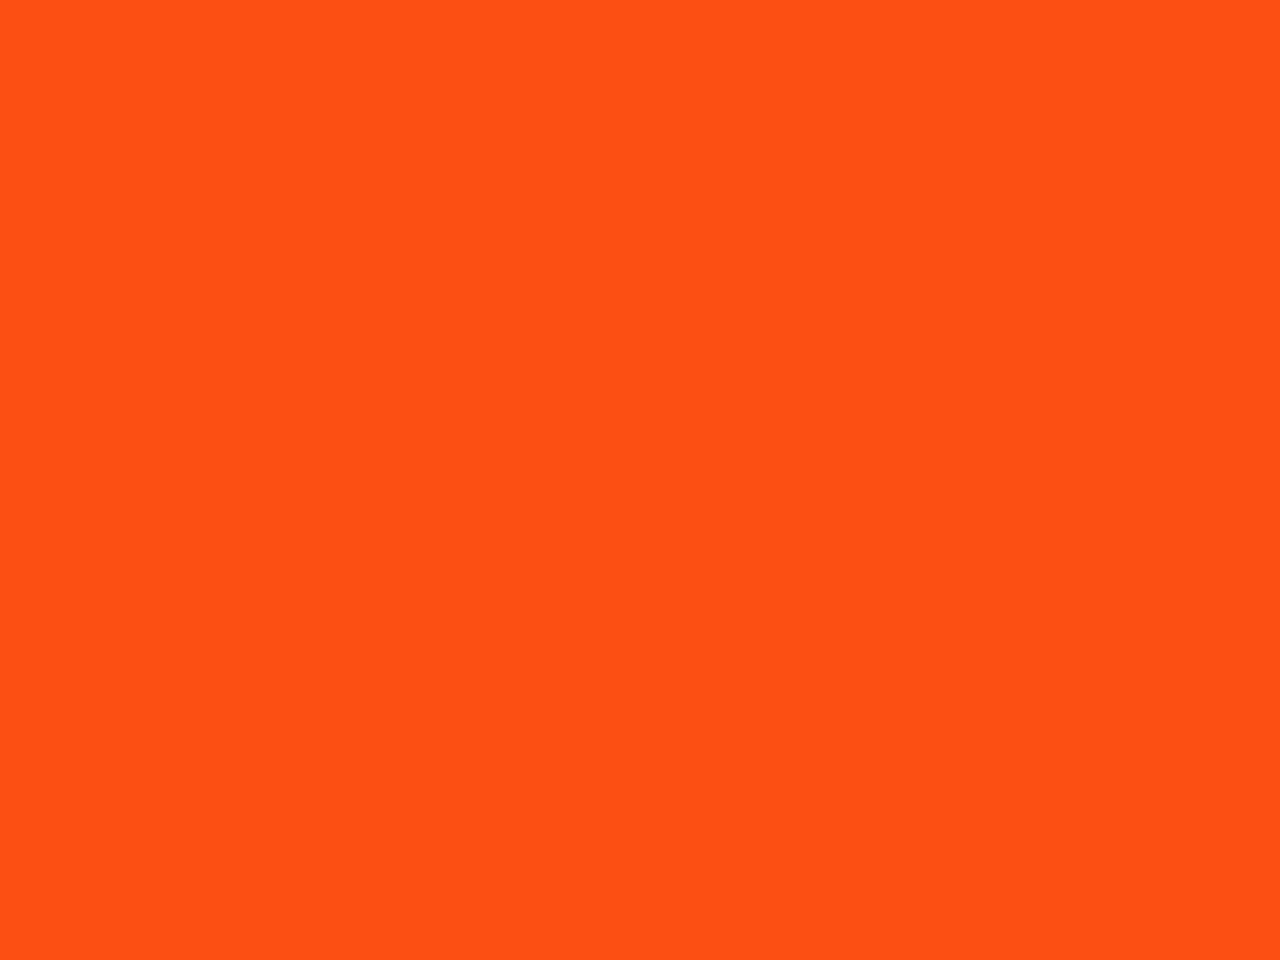 1280x960 Orioles Orange Solid Color Background